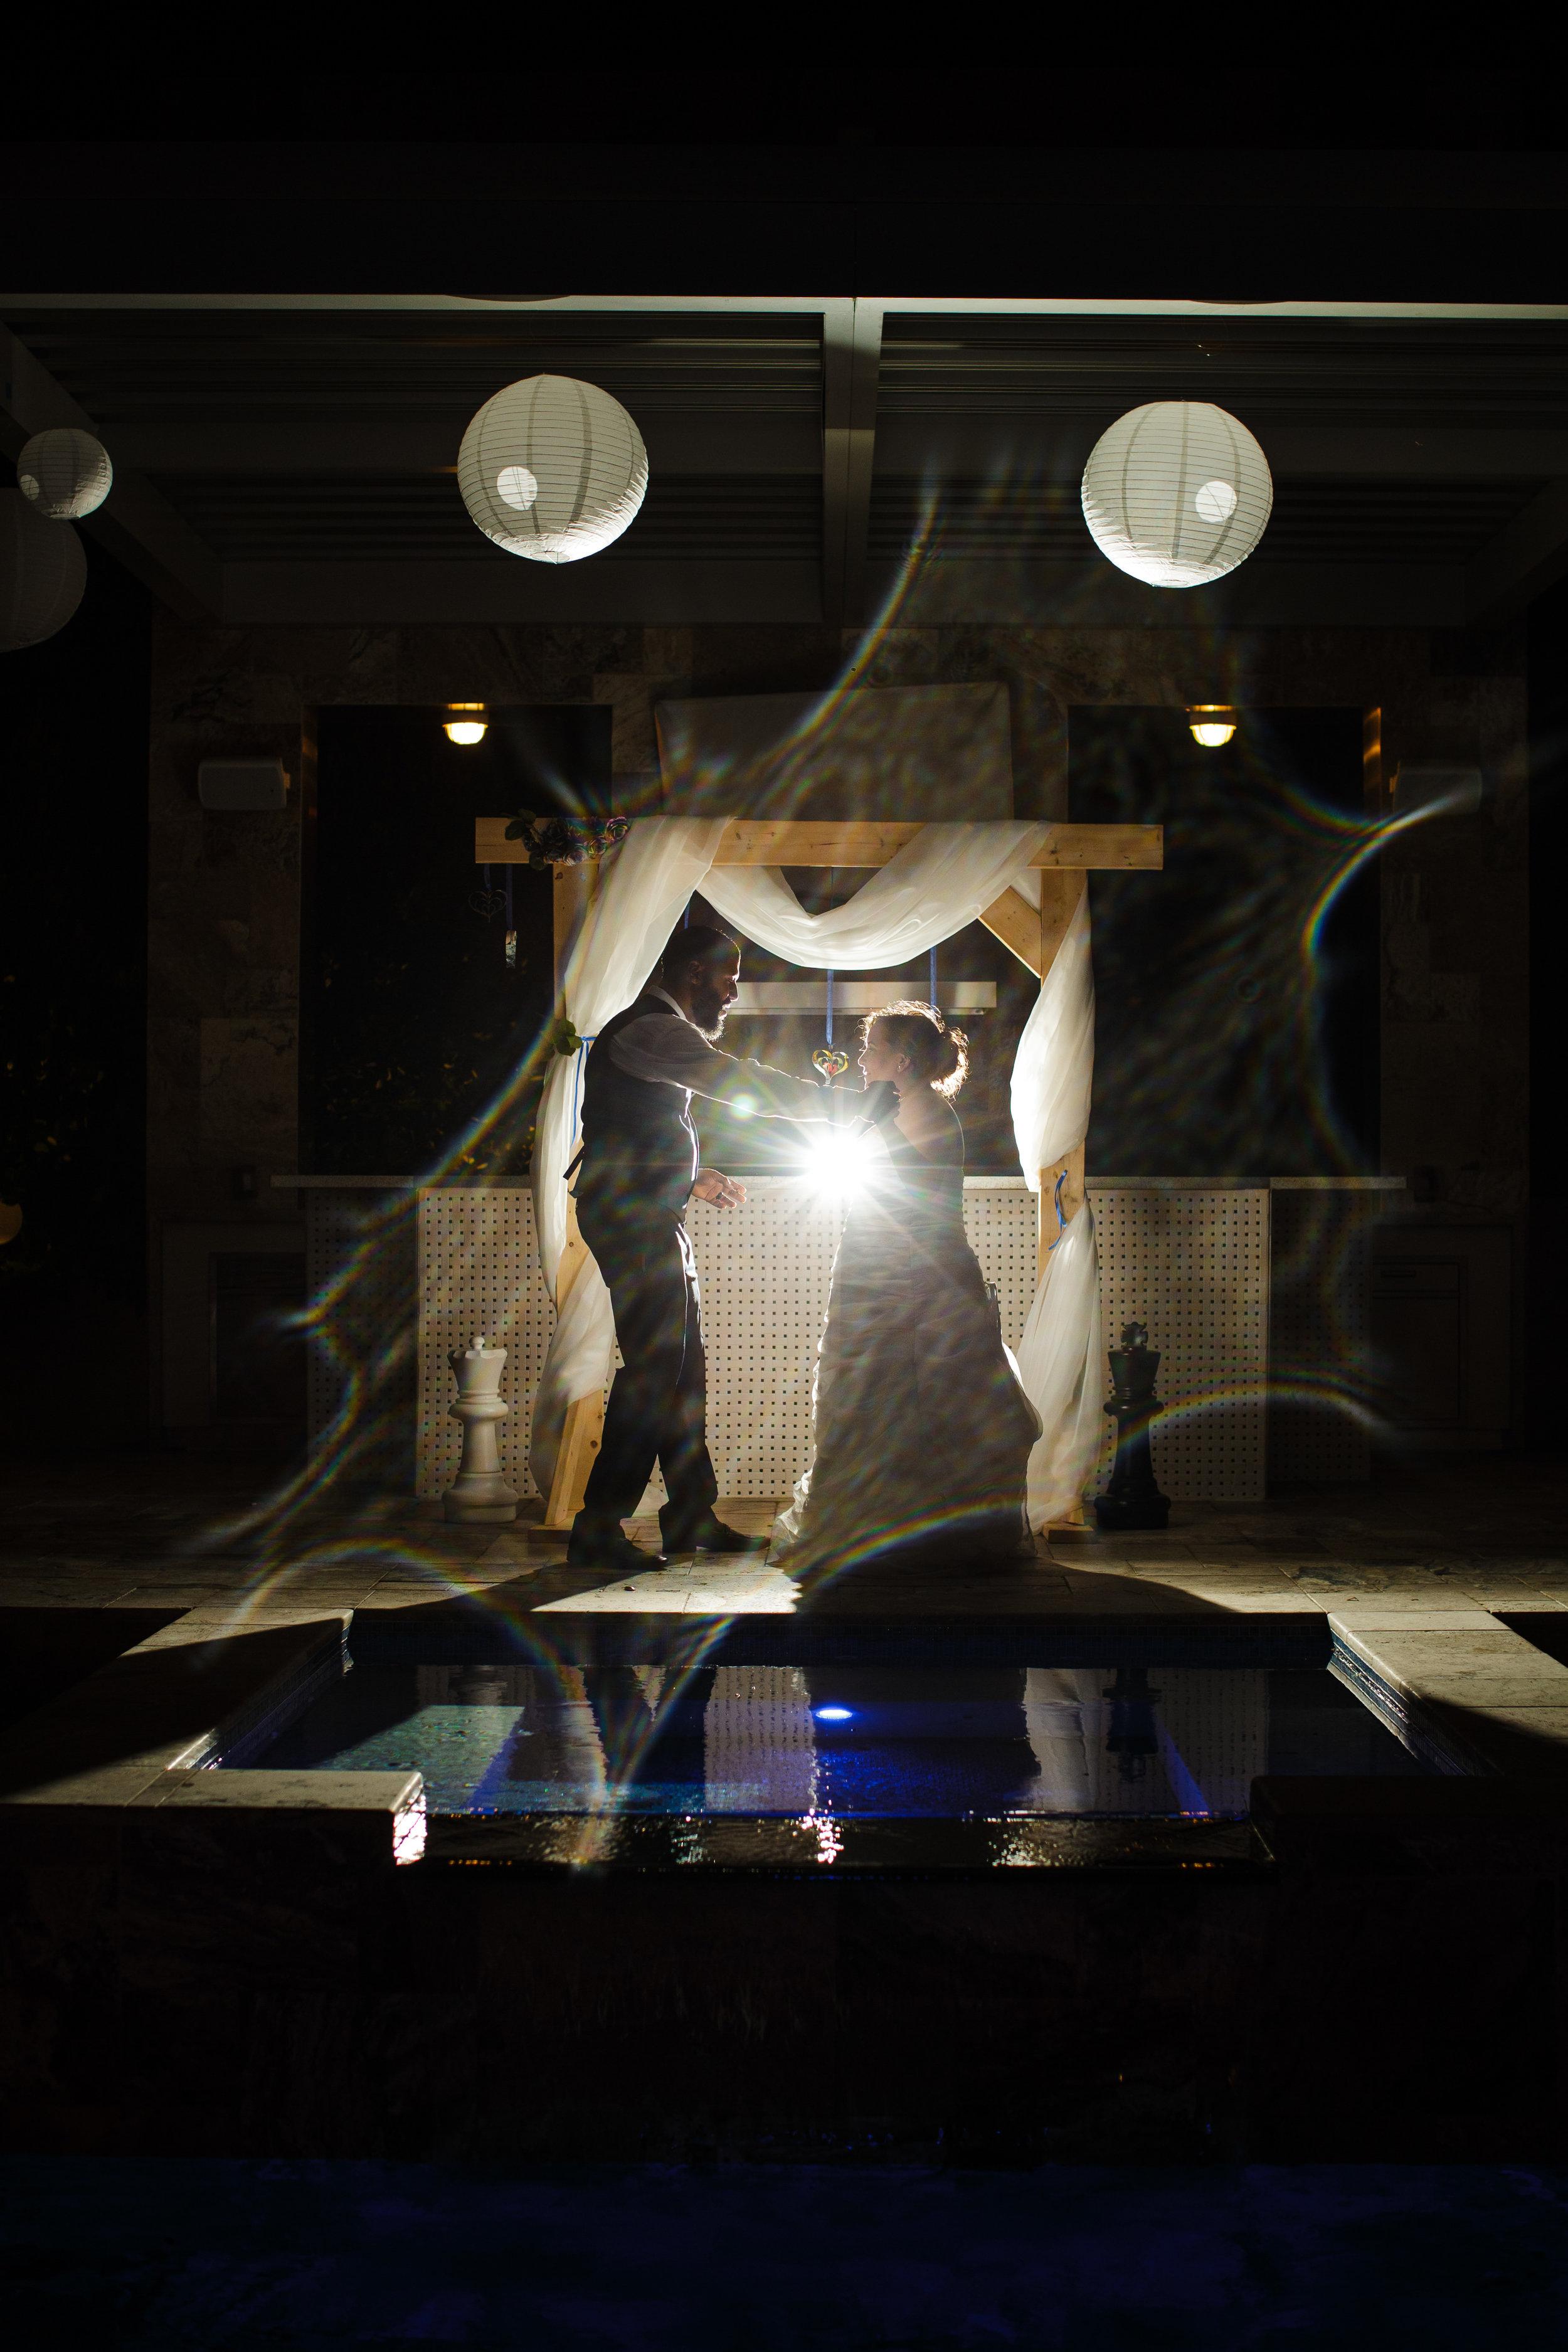 bride-groom-portraits-night-romantic-intimate-tiny-house-photo-weddings.jpg